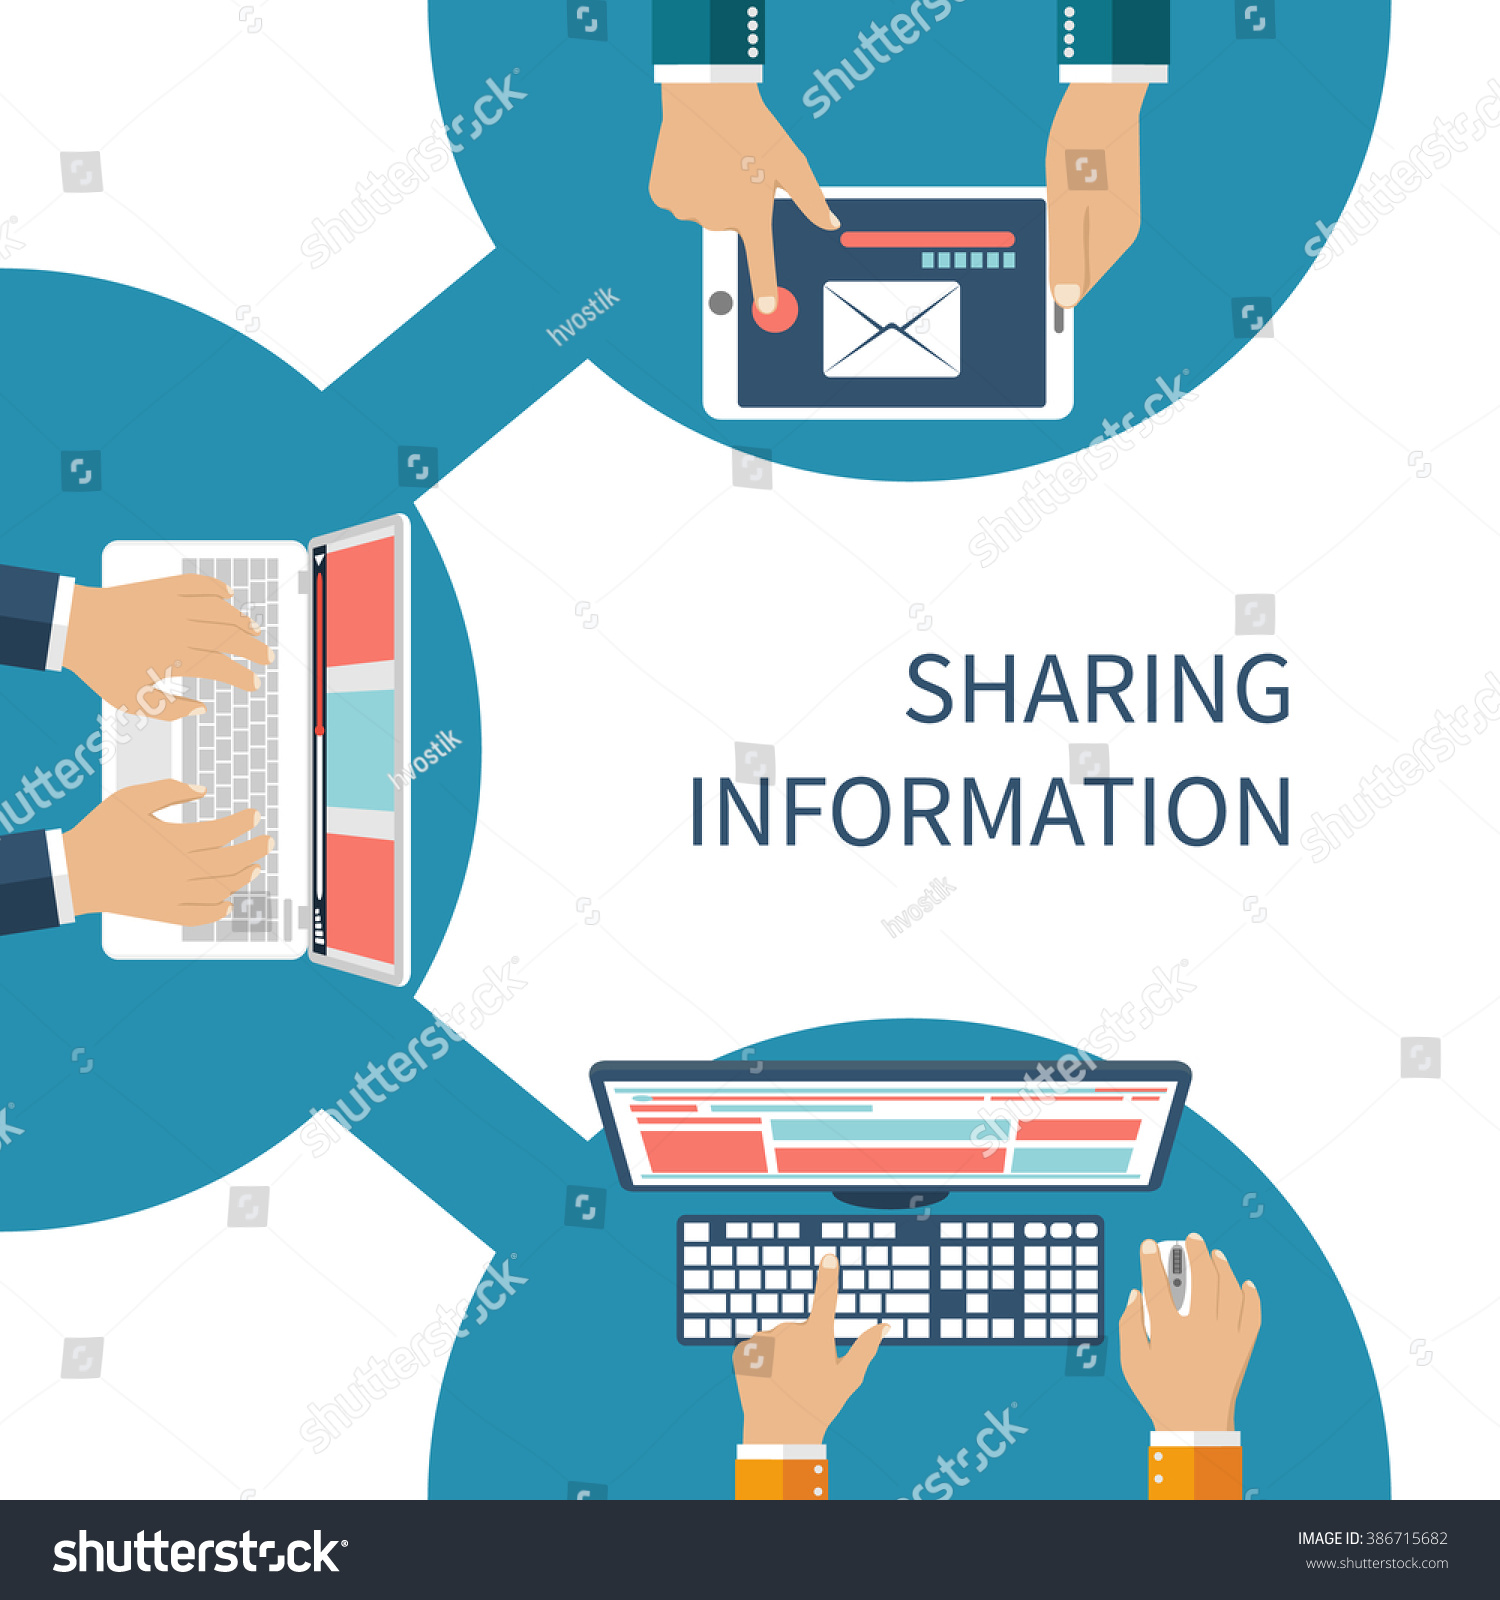 Sharing Information Concept Vector Social Network Stock